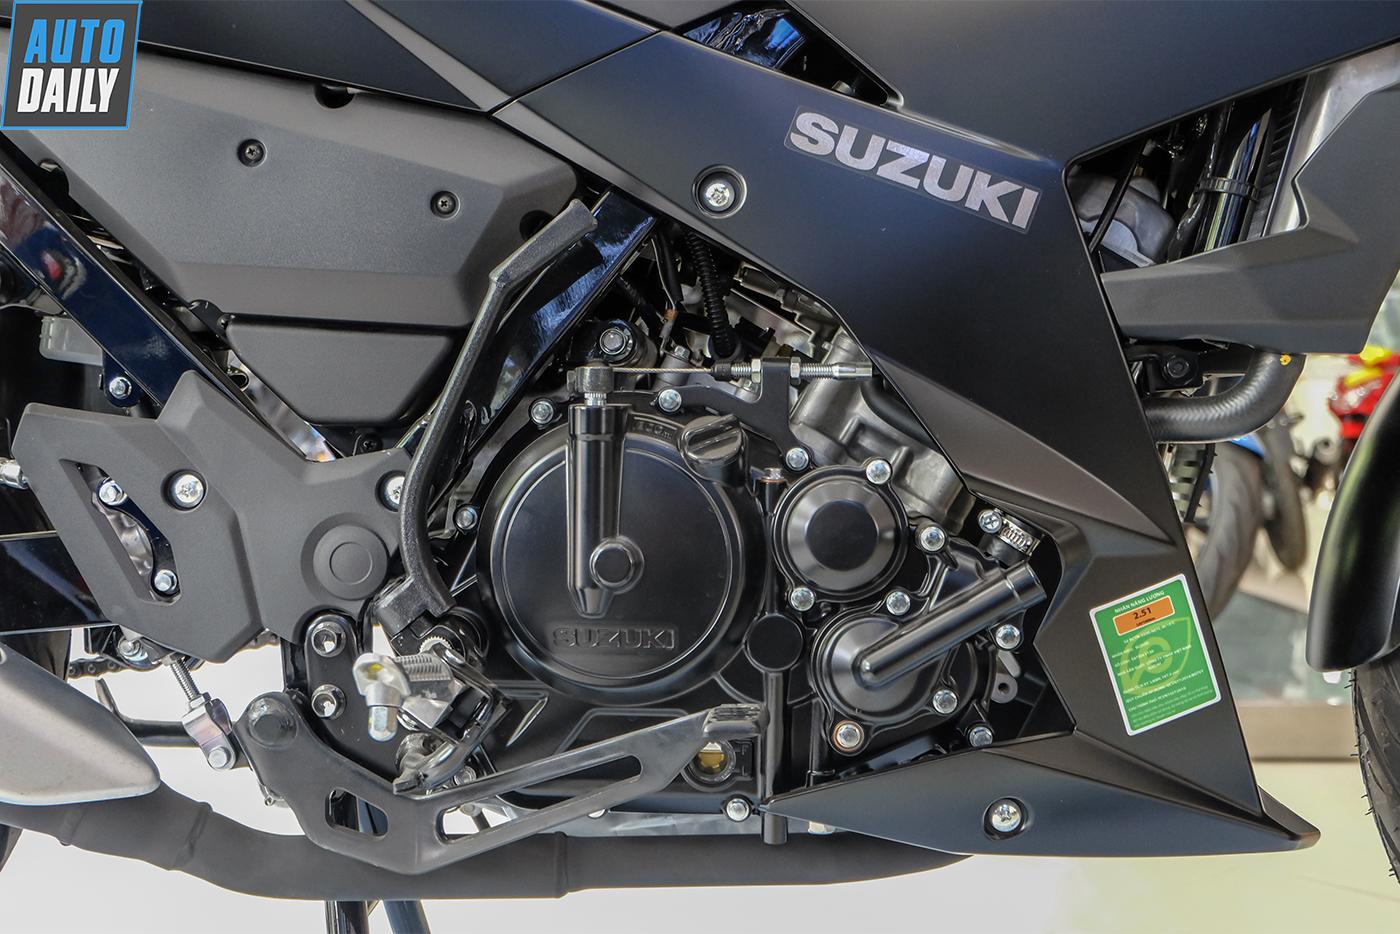 Chi tiết Suzuki Satria F150 nhập chính hãng có giá từ 51,99 triệu đồng suzuki-satria-f150-1.jpg